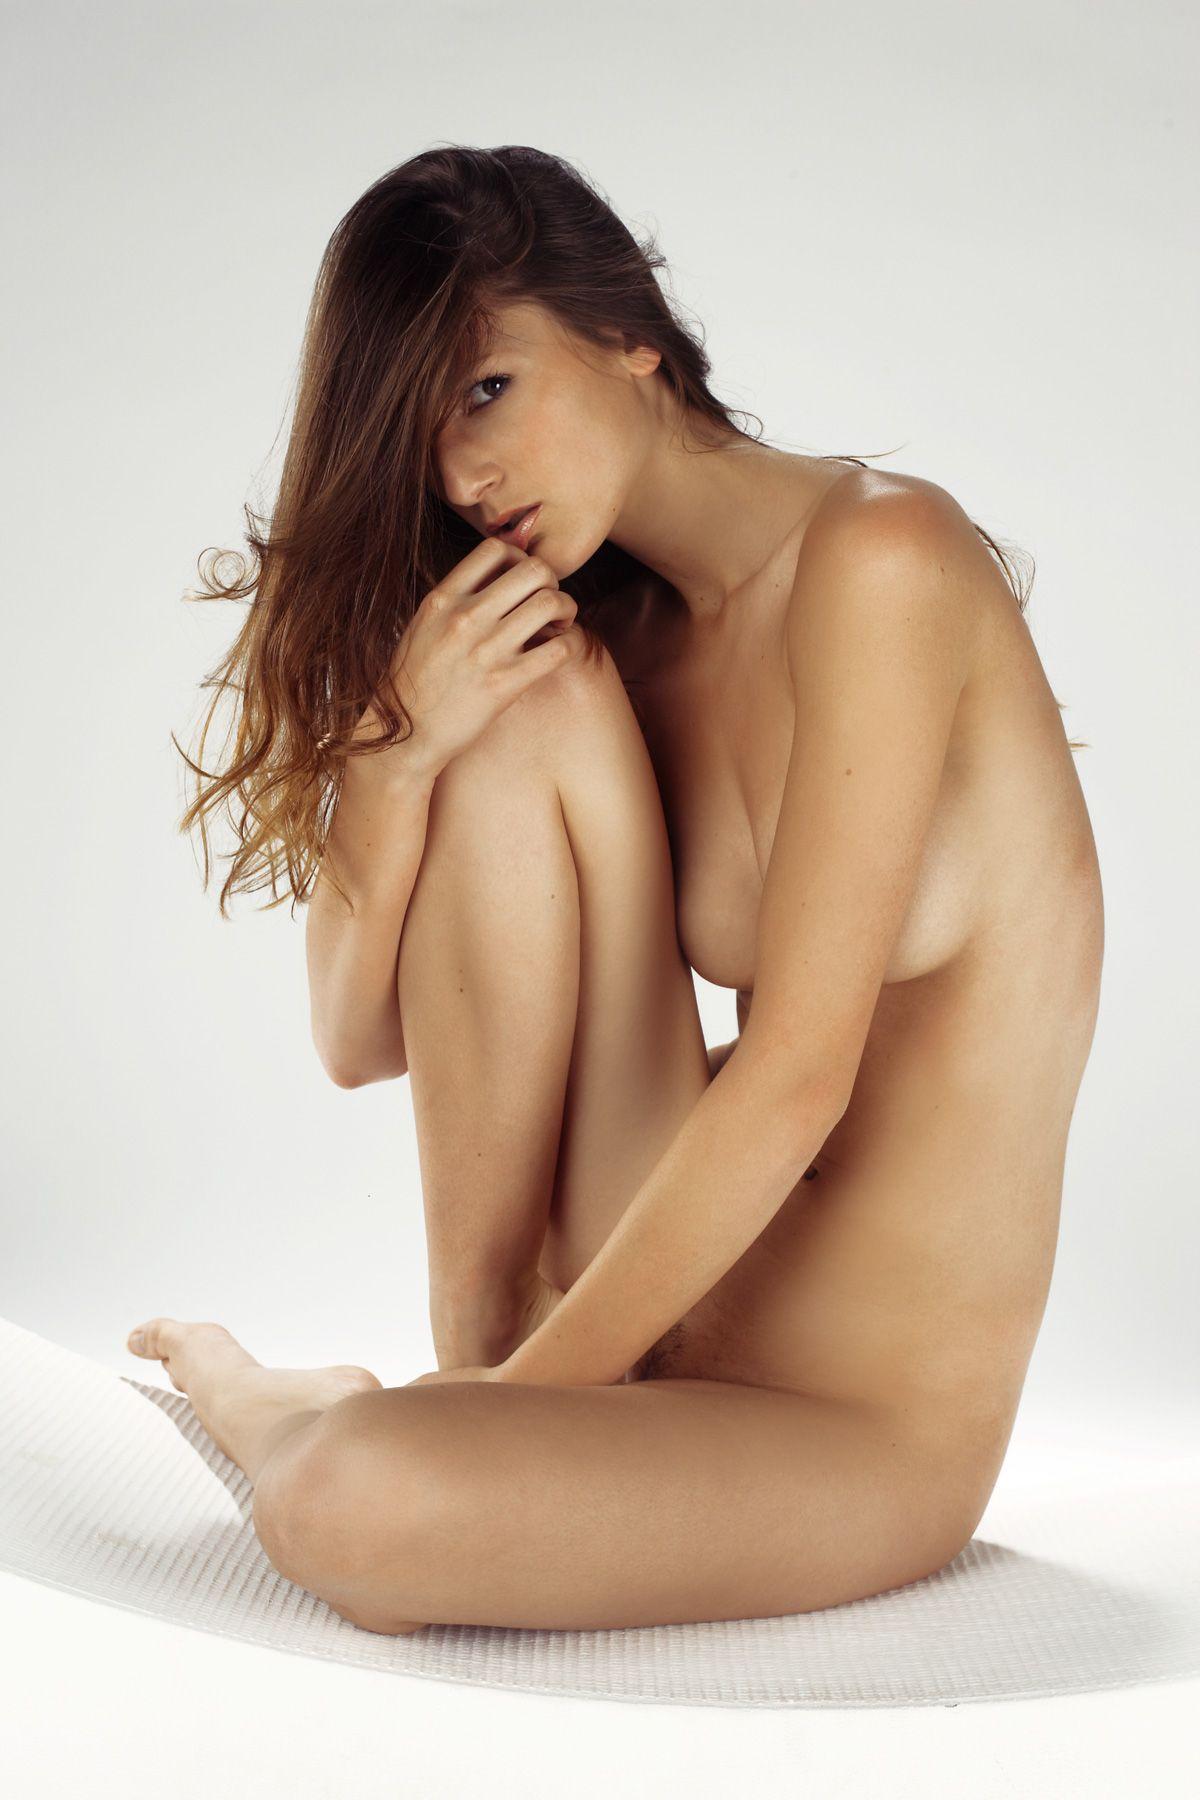 sites pantyhose sex stories brilliant